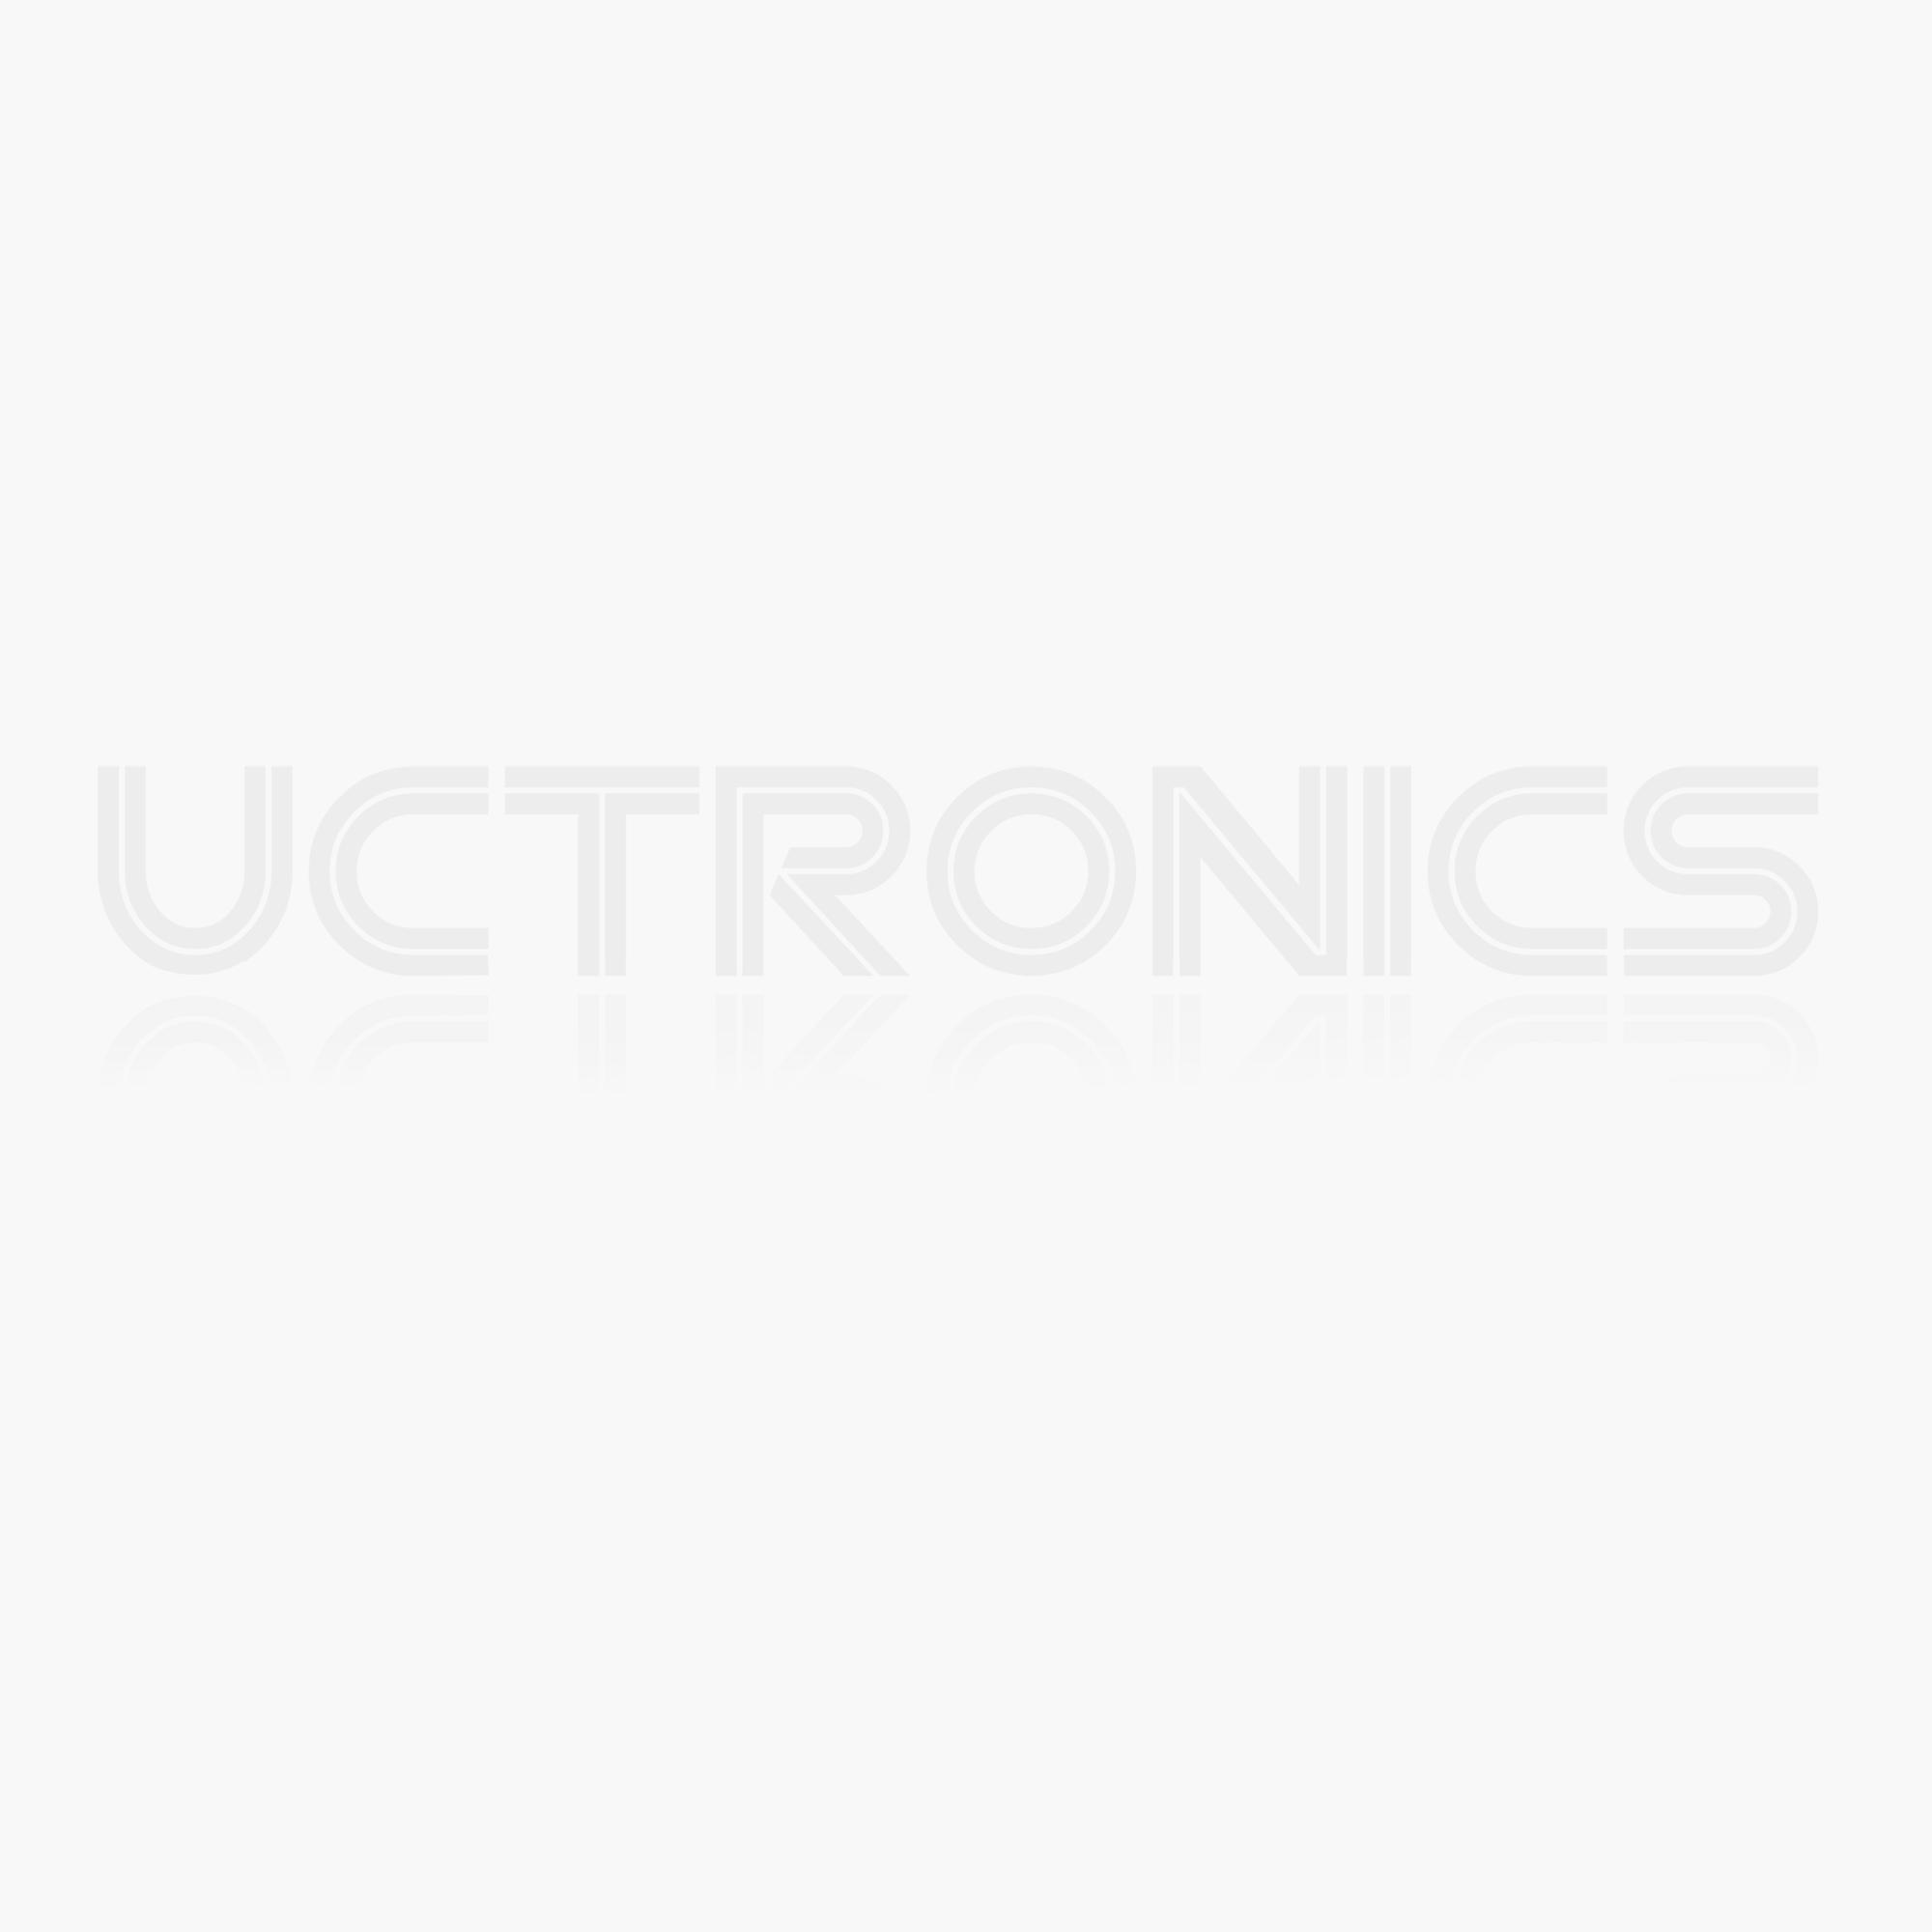 Aluminum Oxidation heat block 20*16*11mm for 3D Printer Extruder Reprap Makerbot